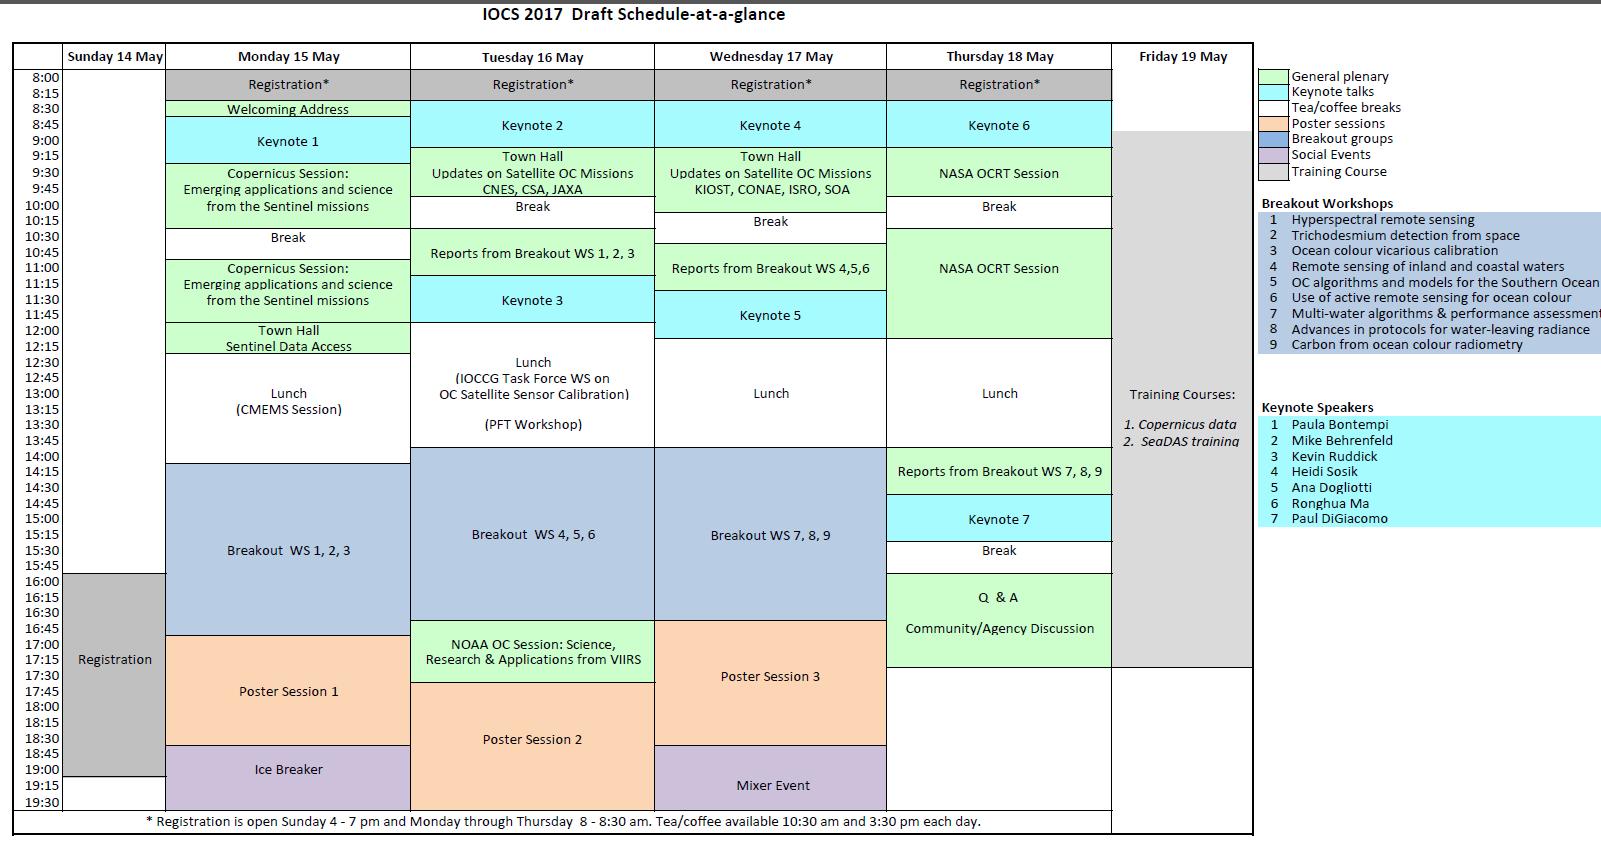 draft-schedule-24-mar-2017